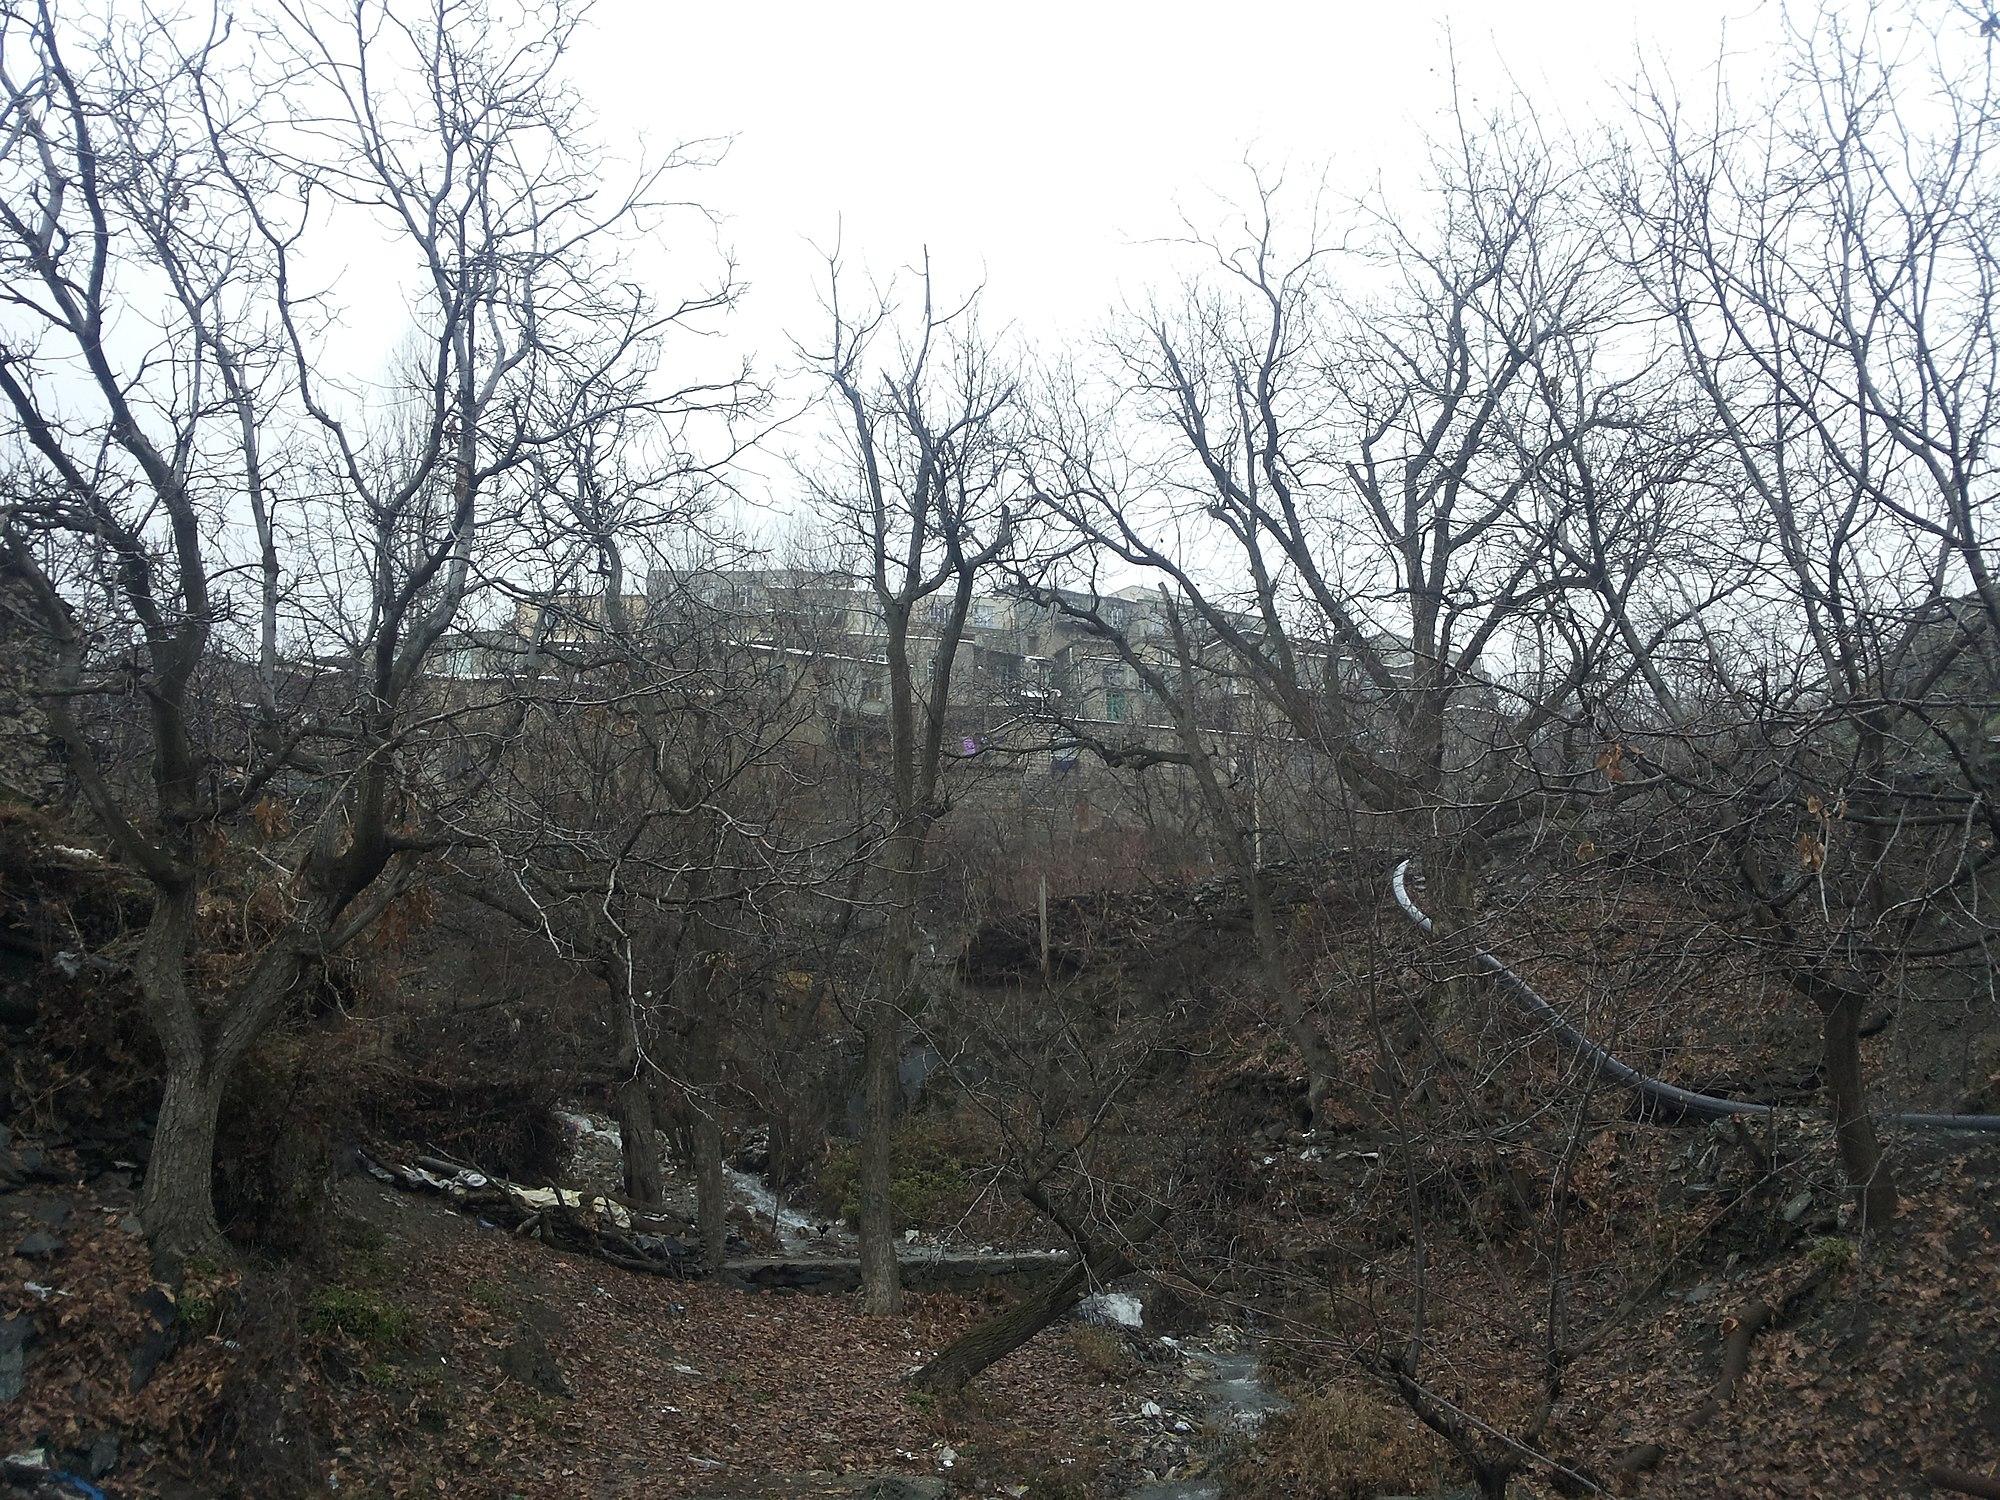 هزارخانی (سروآباد)